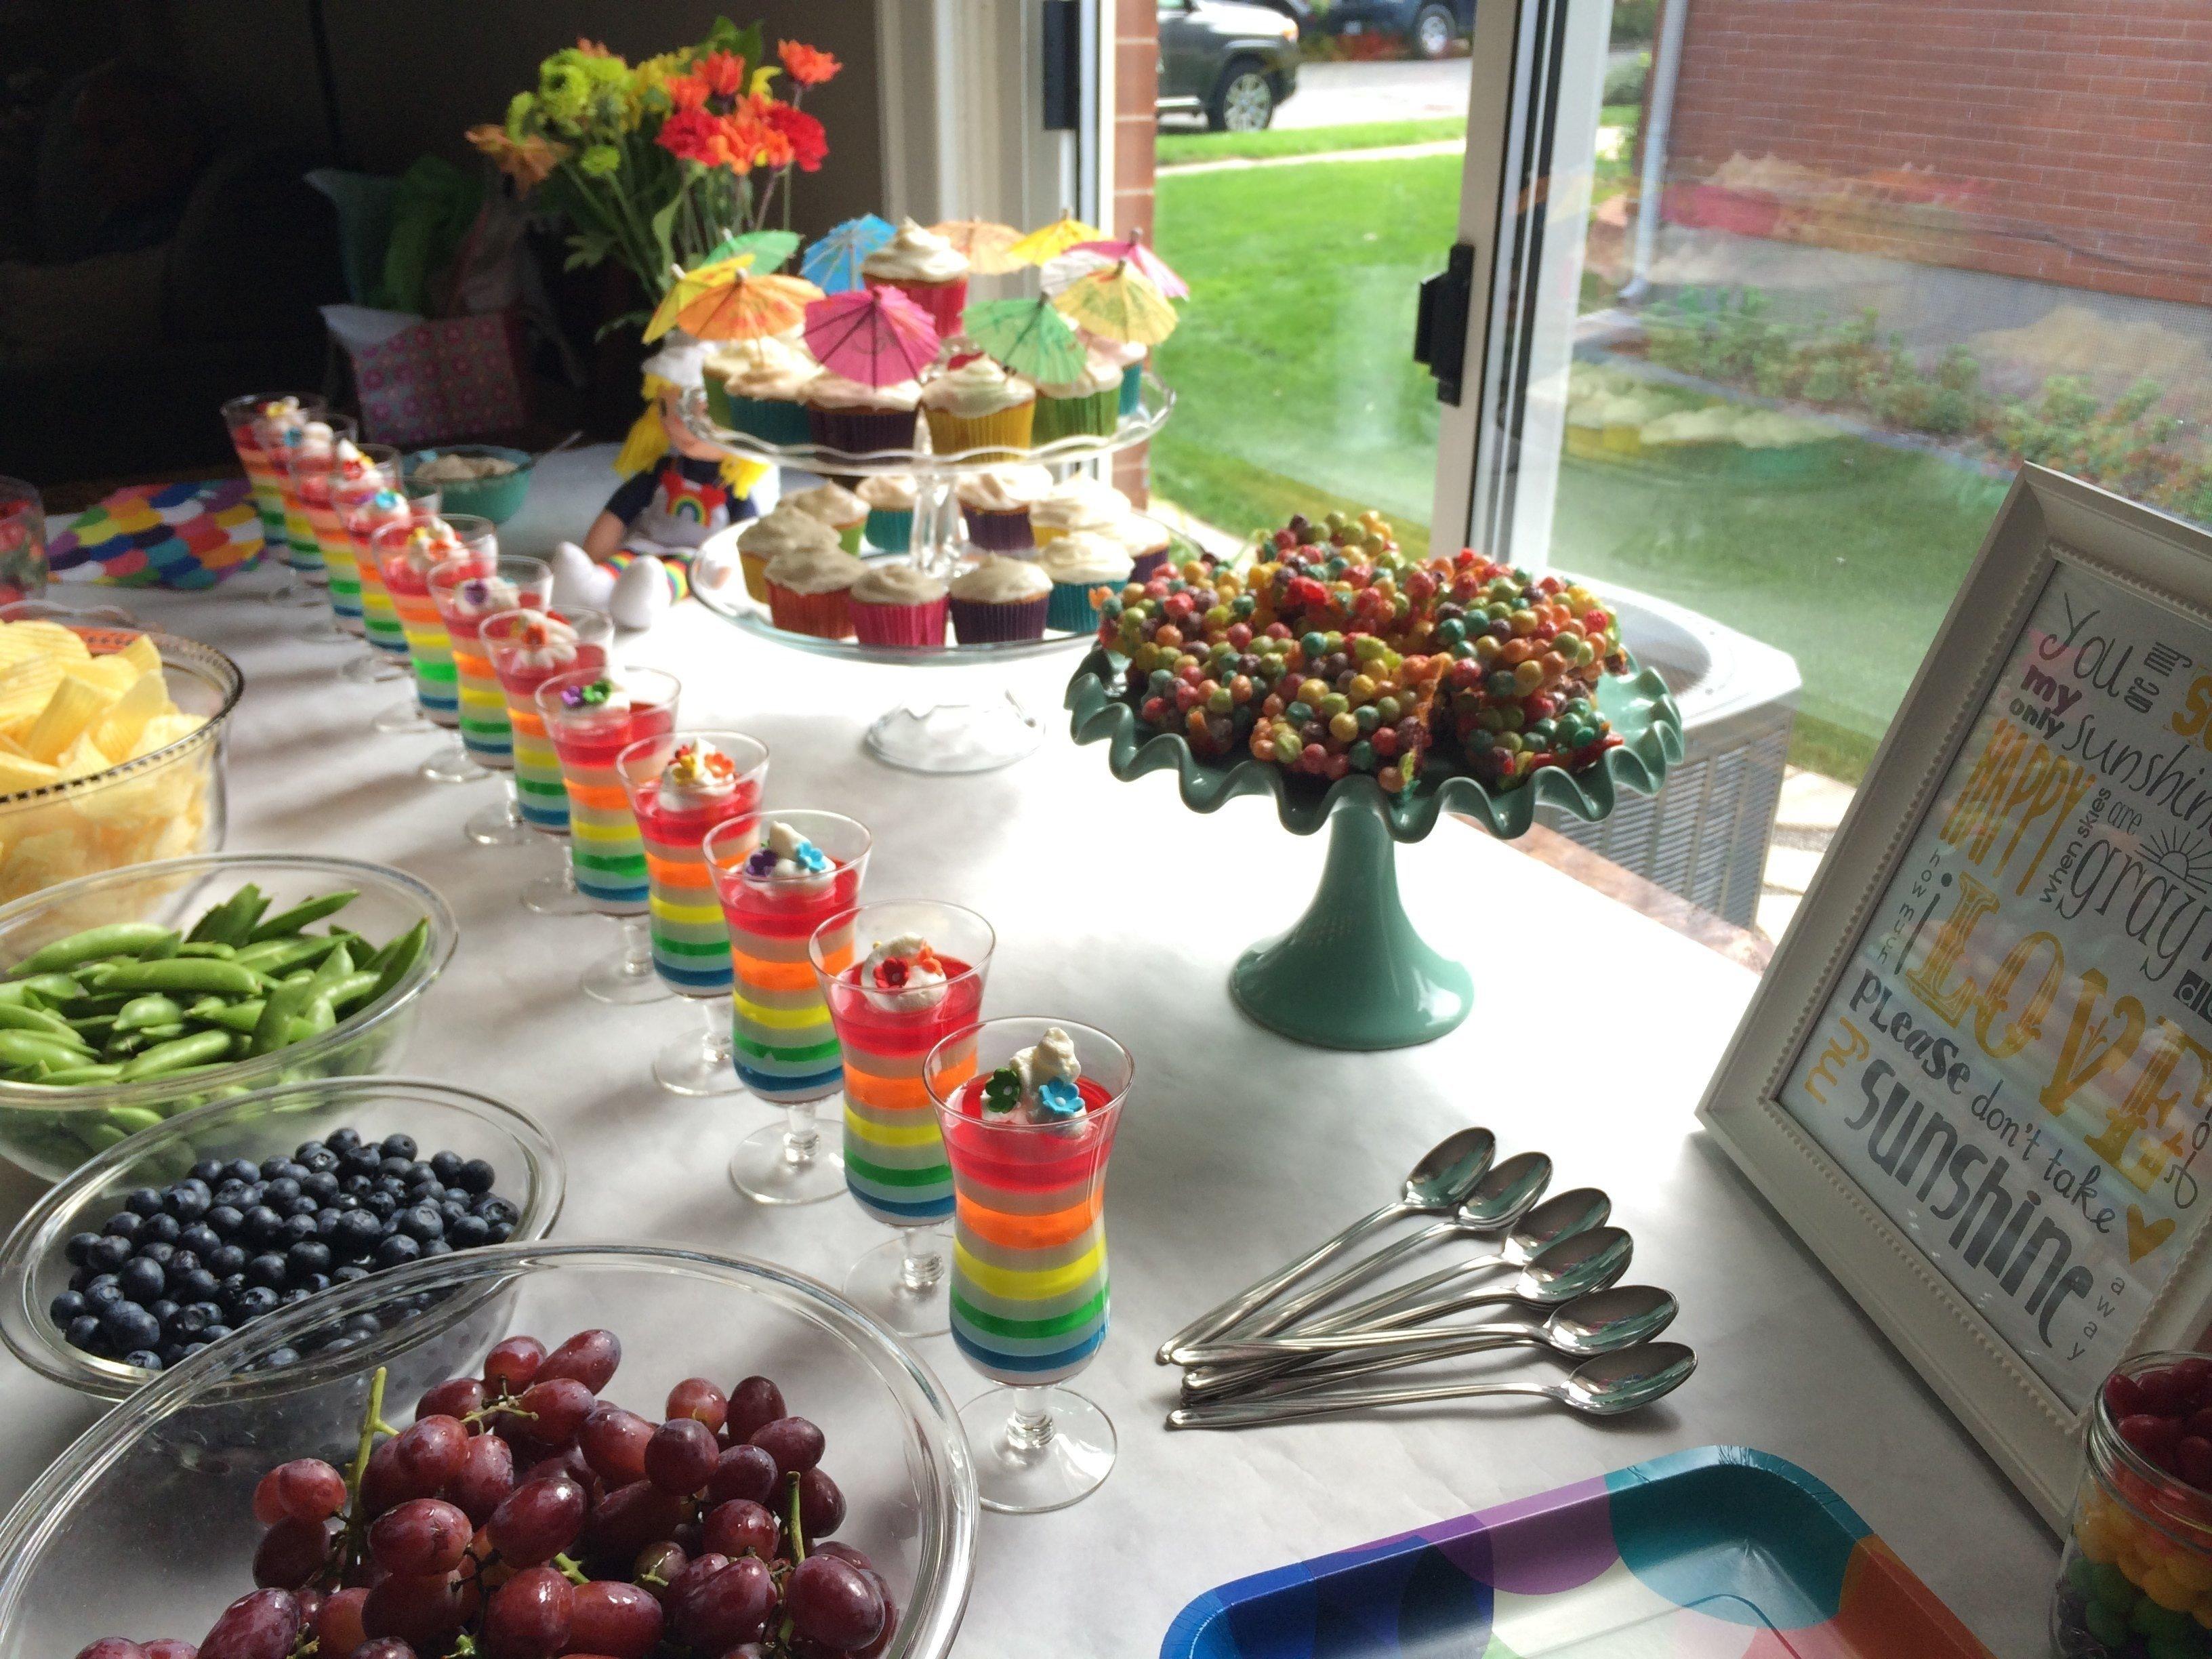 10 Spectacular 5 Year Old Girl Birthday Ideas 5 year old little girl birthday party ideas birthday cakes 3 2020